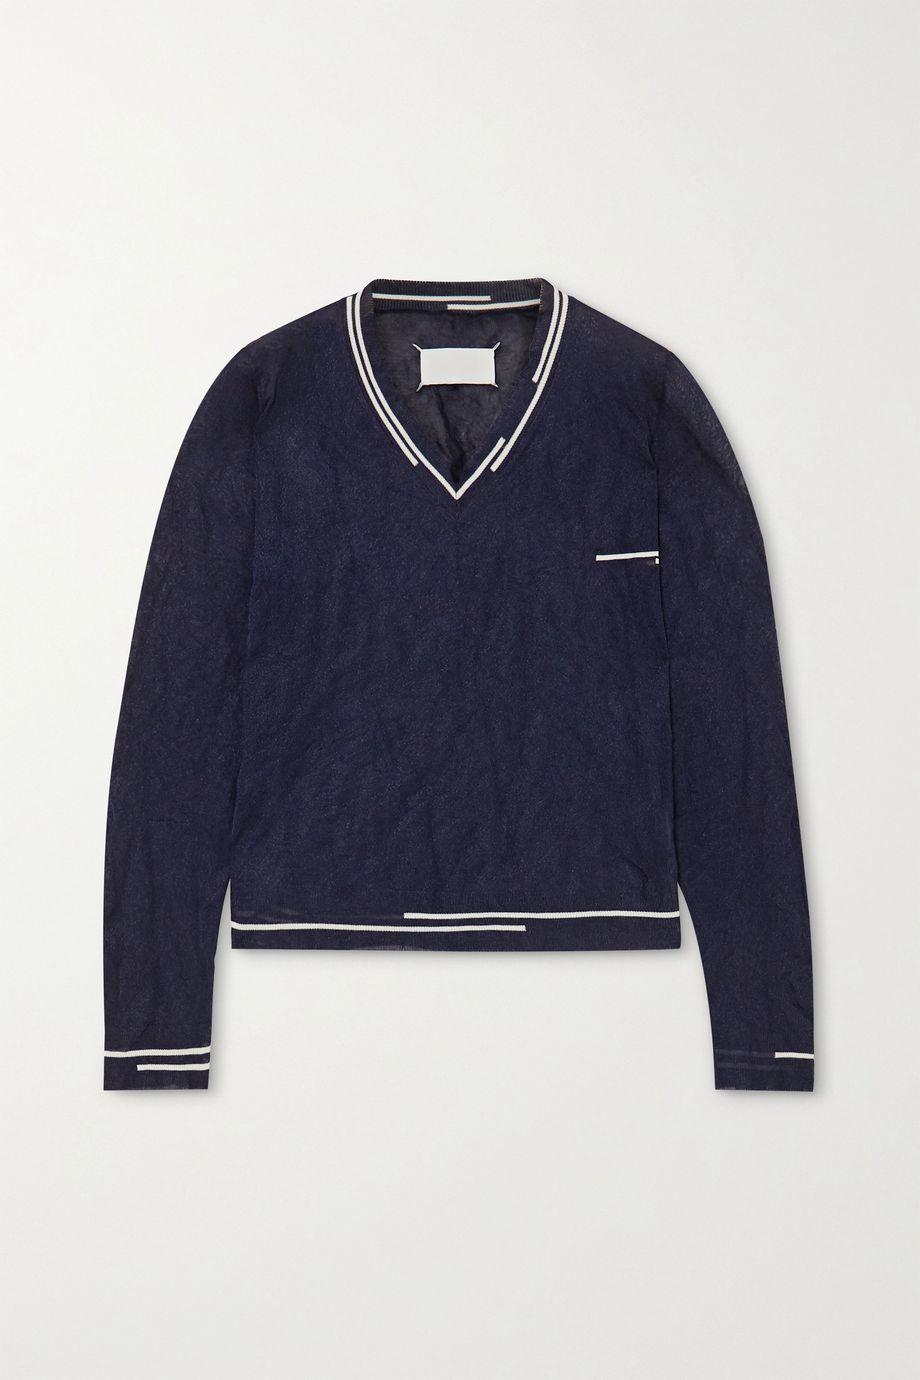 Maison Margiela 双色褶皱金属感针织毛衣